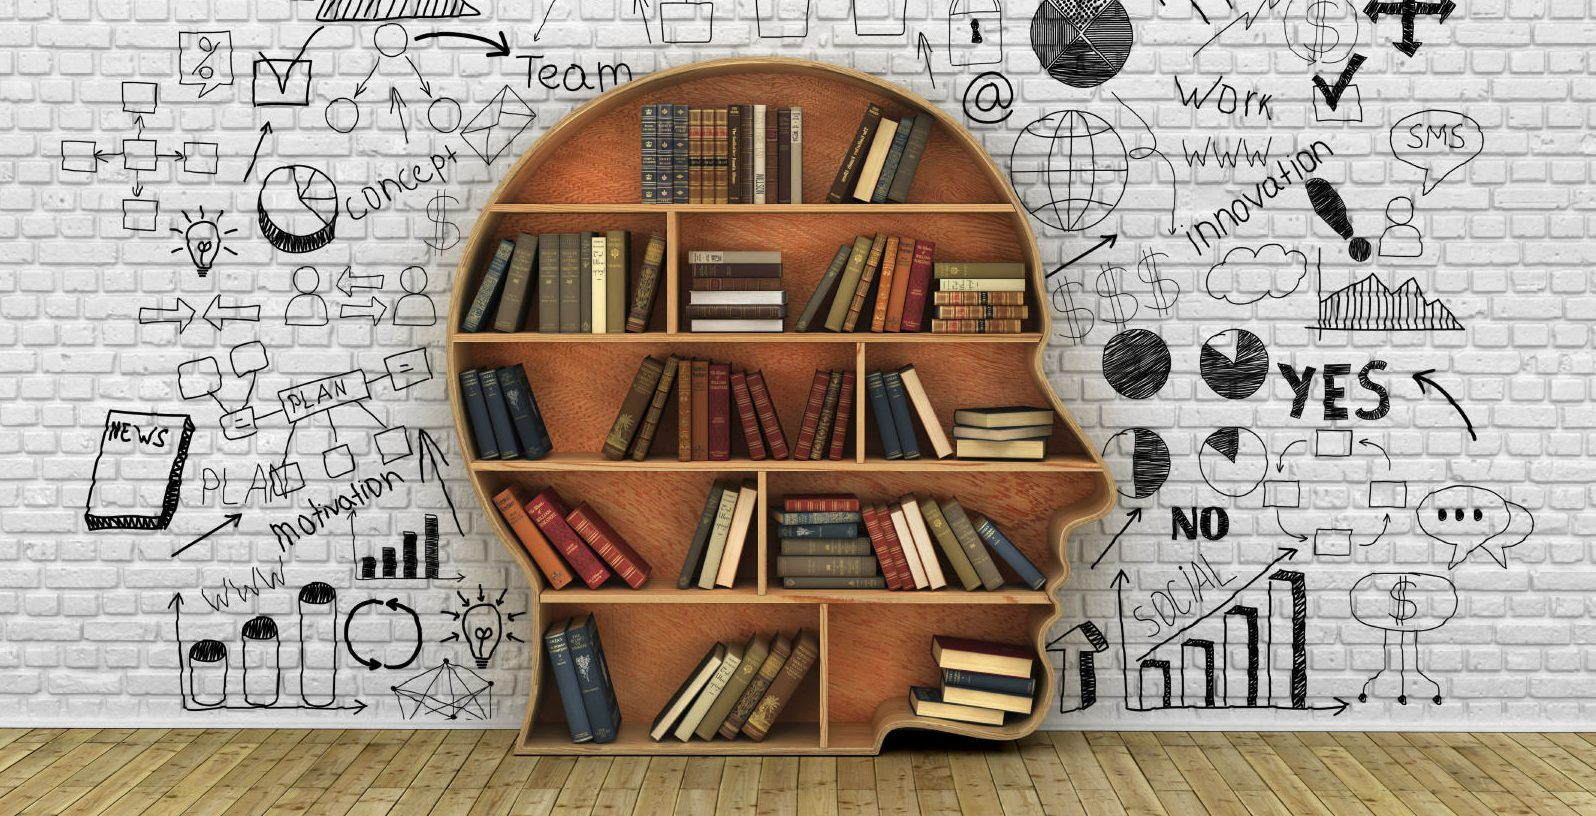 Libros para tener la cabeza llena de cosas interesantes